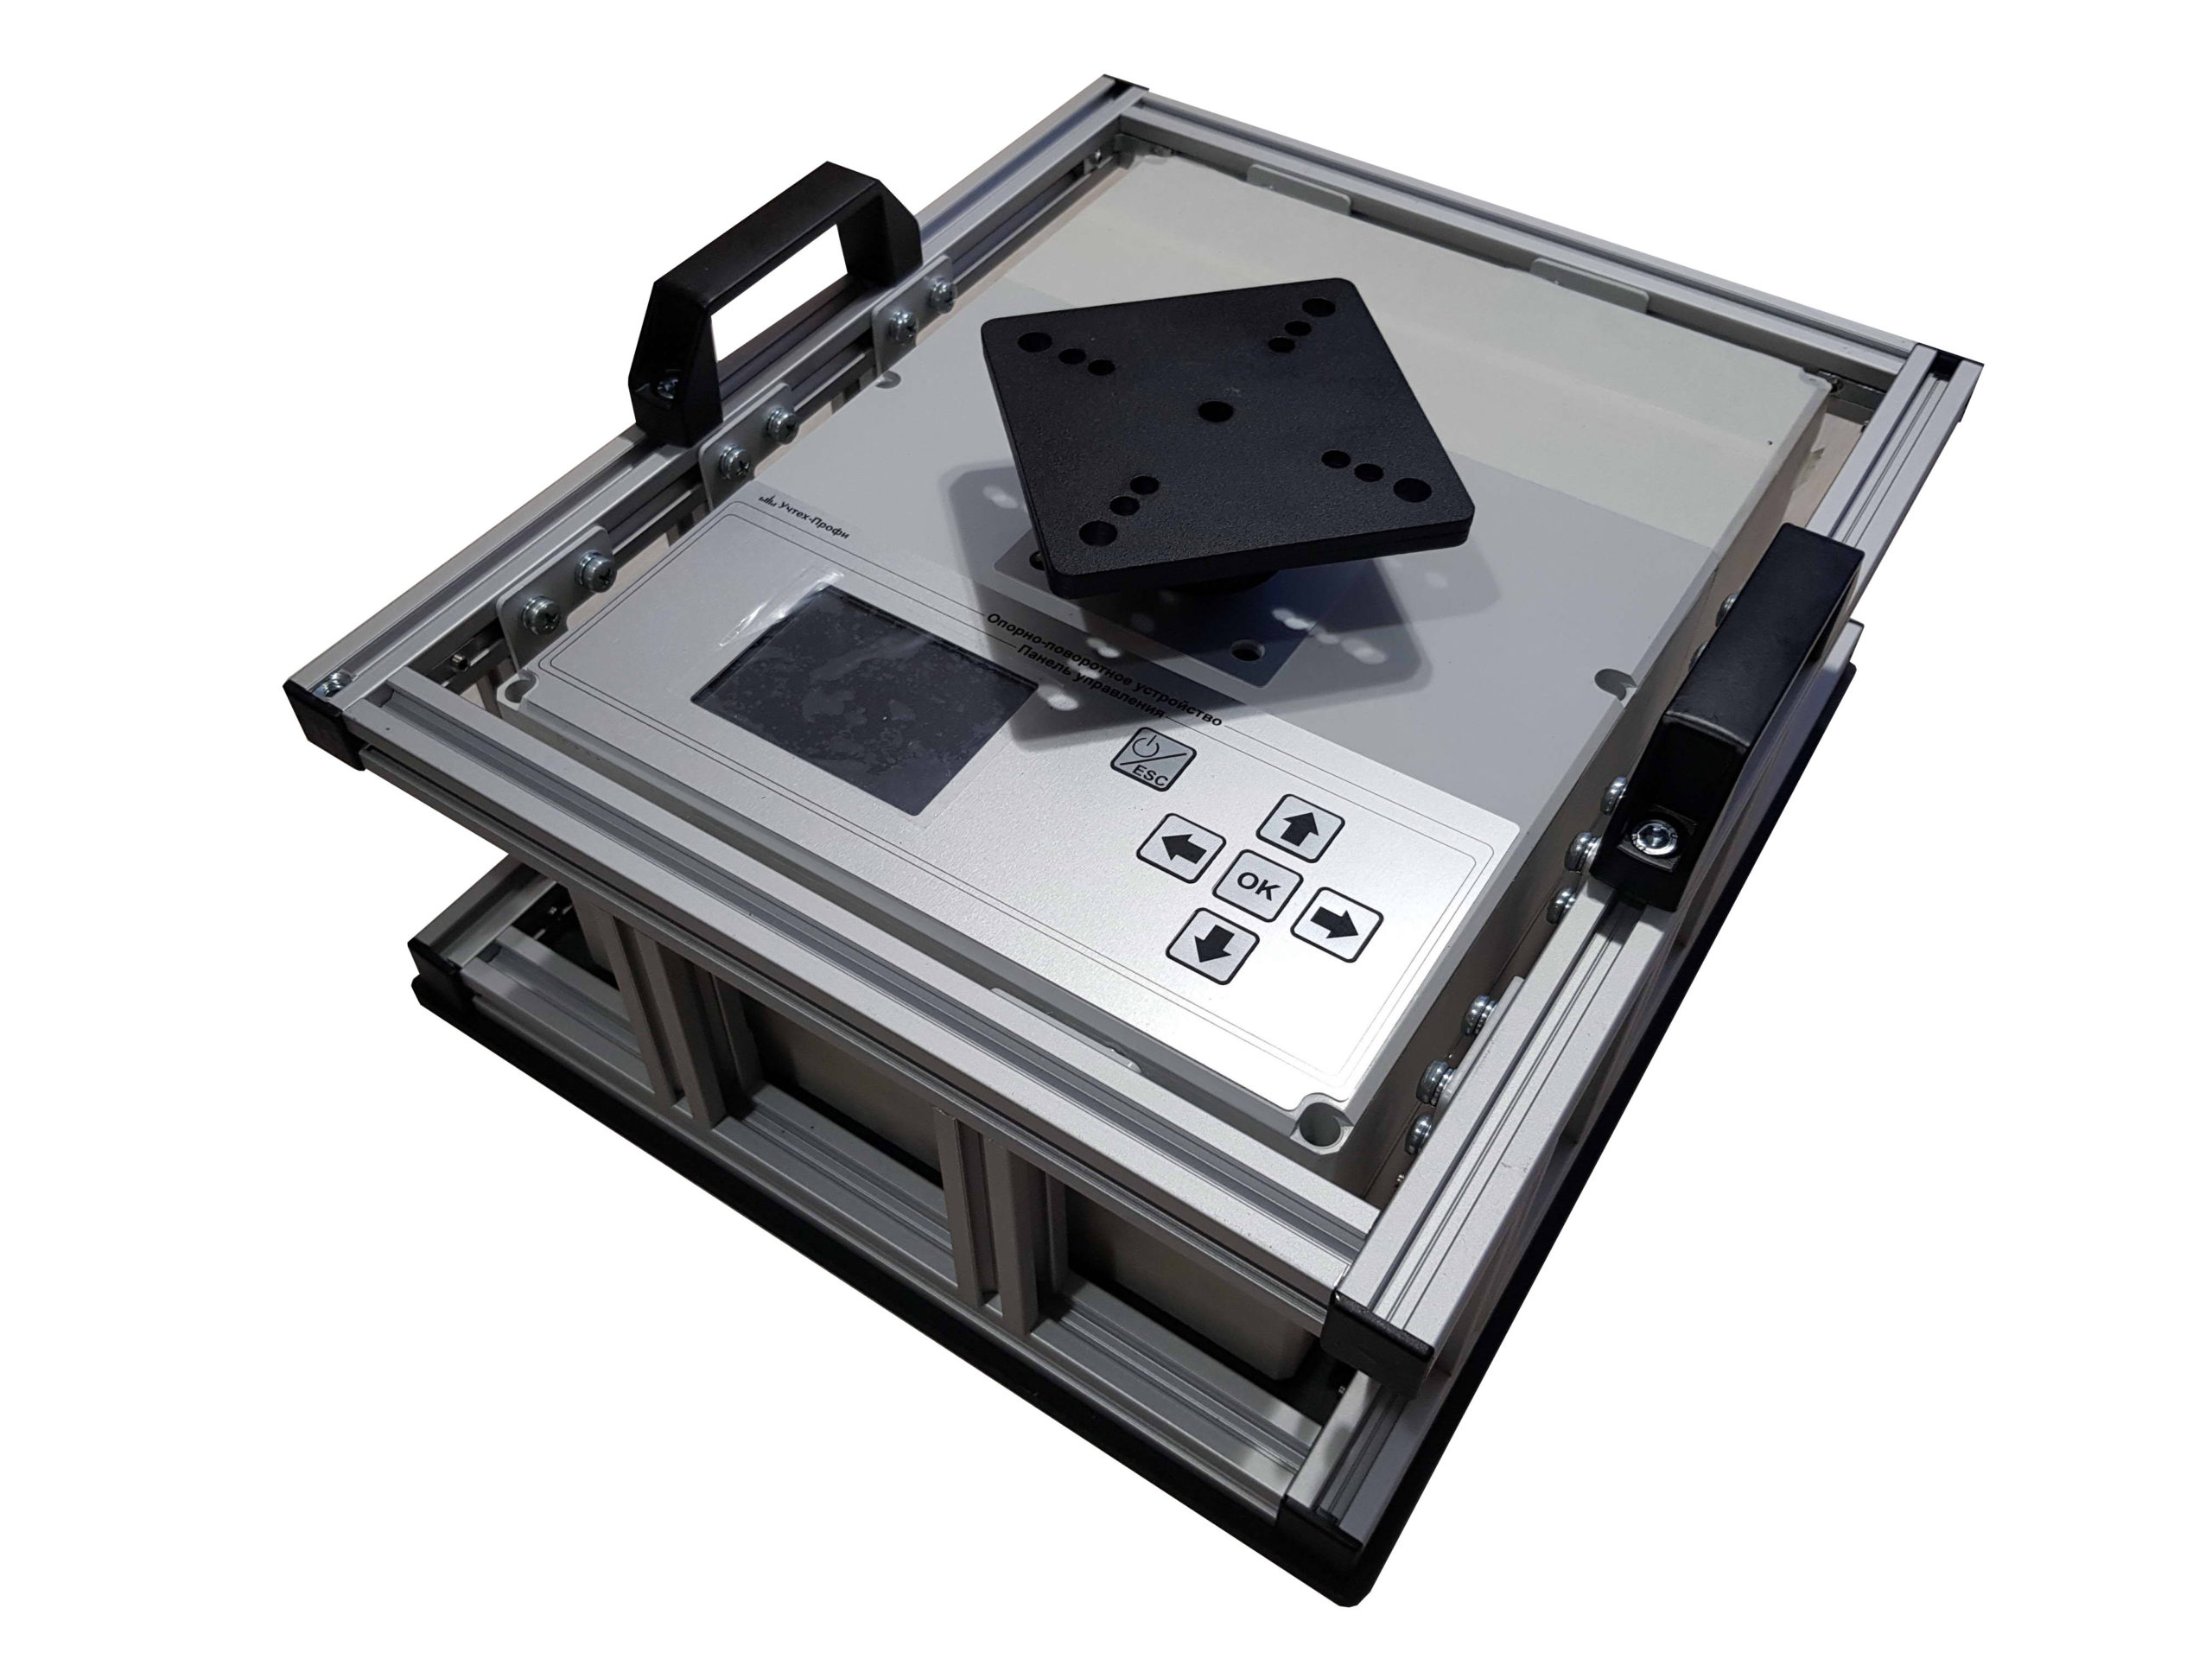 Точное опорно-поворотное устройство для антенных устройств